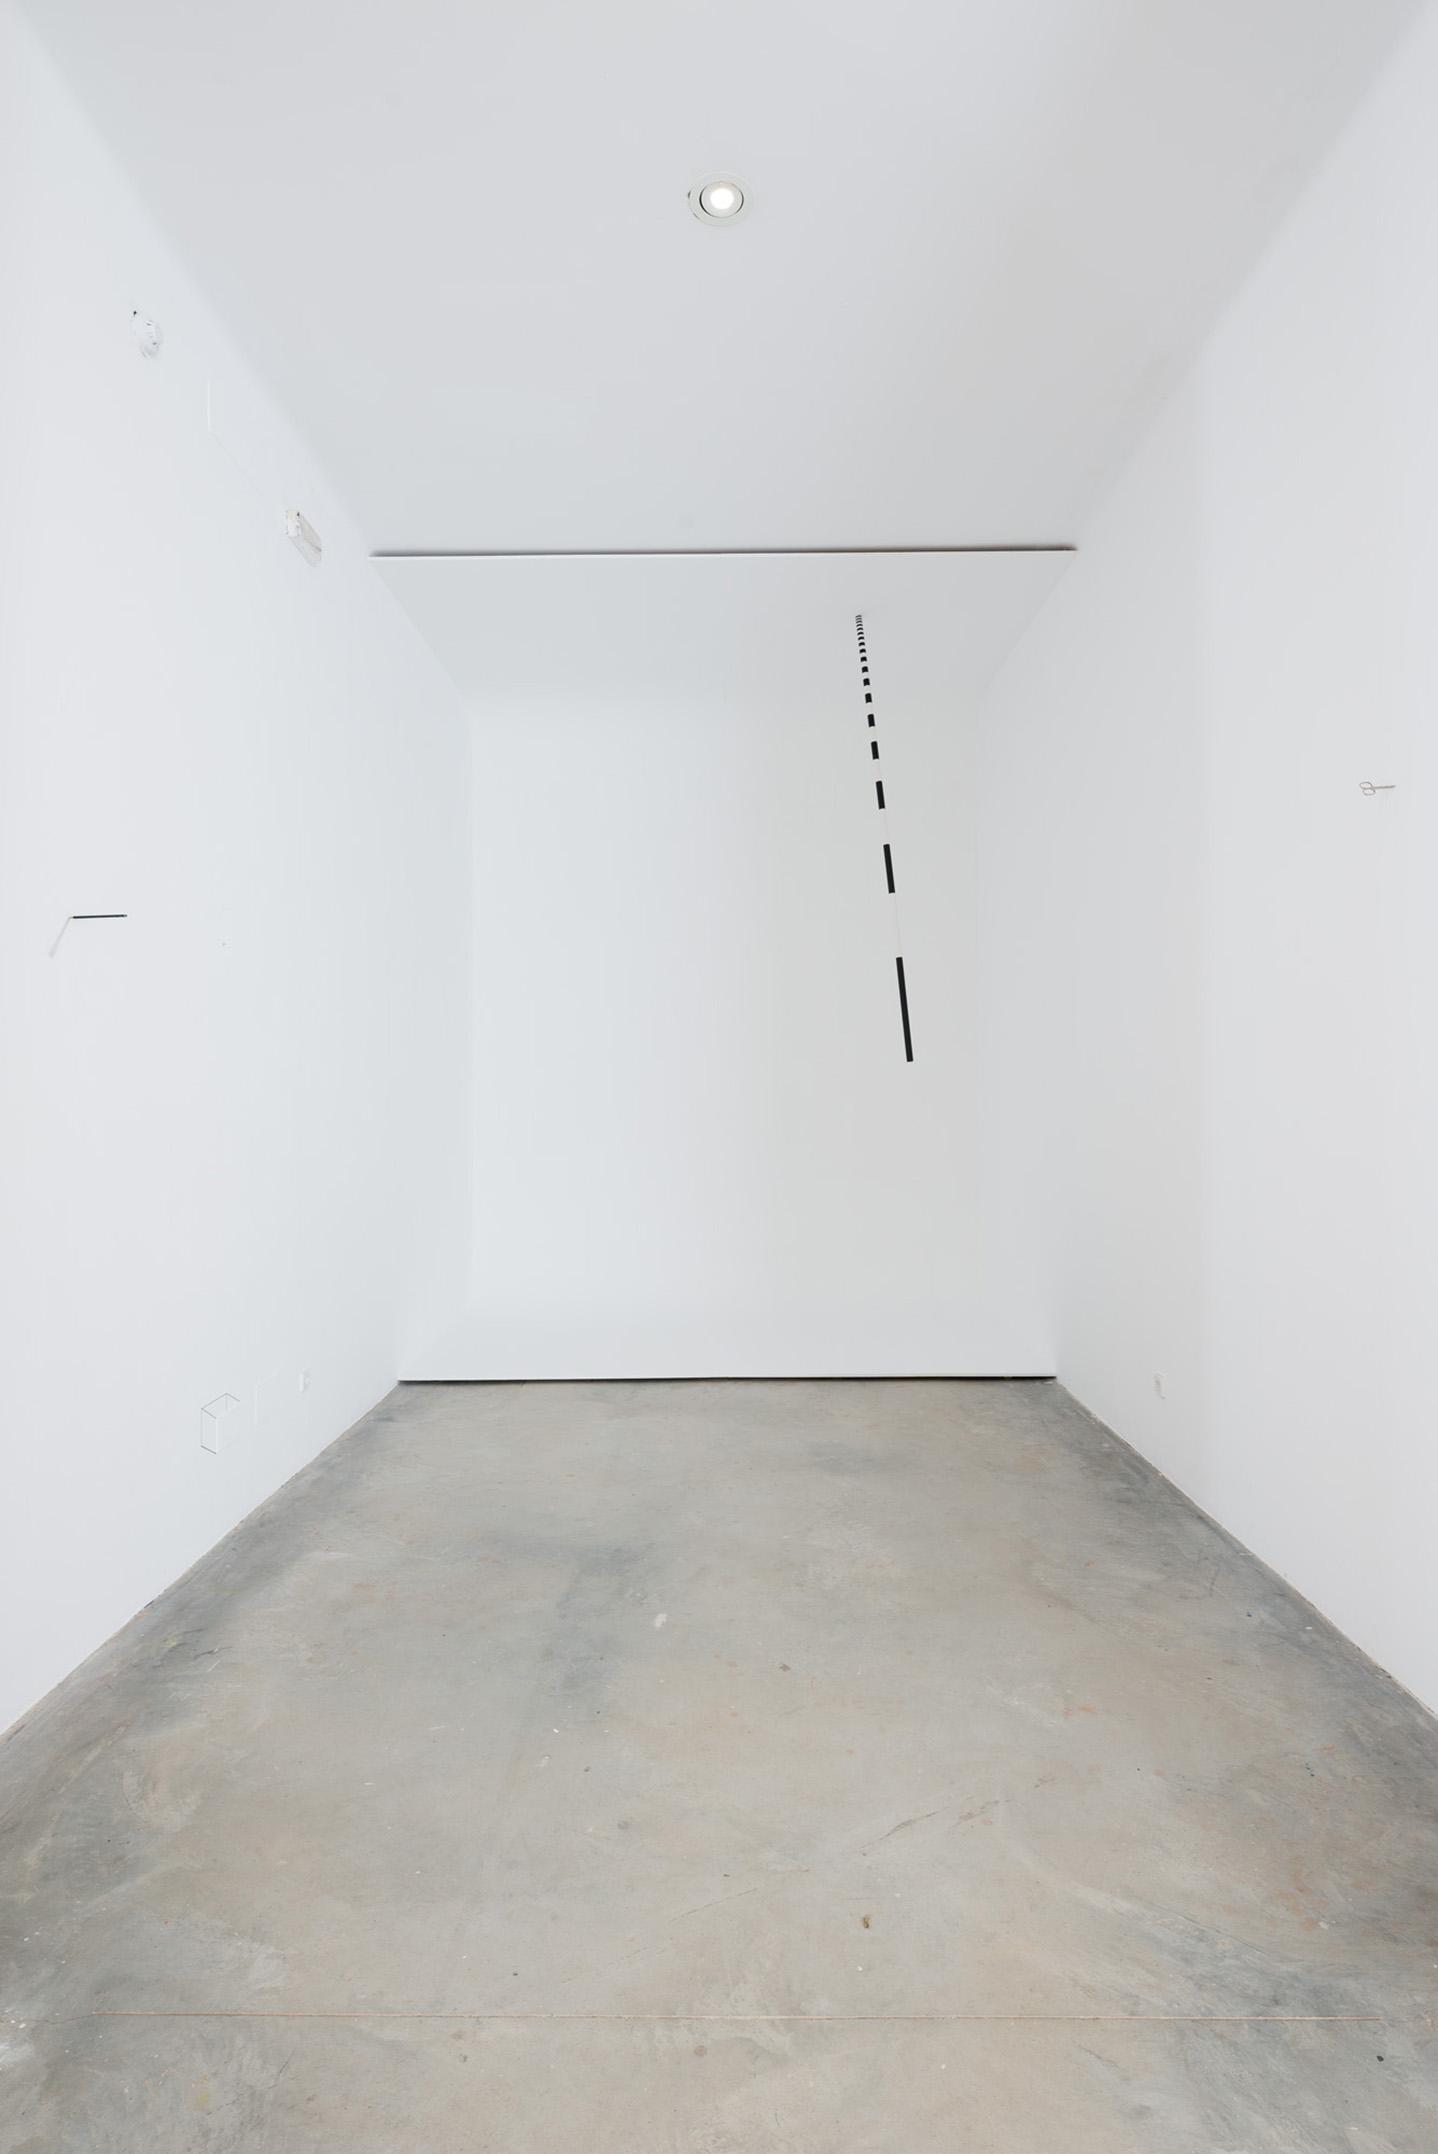 white room + Eddy, 2019